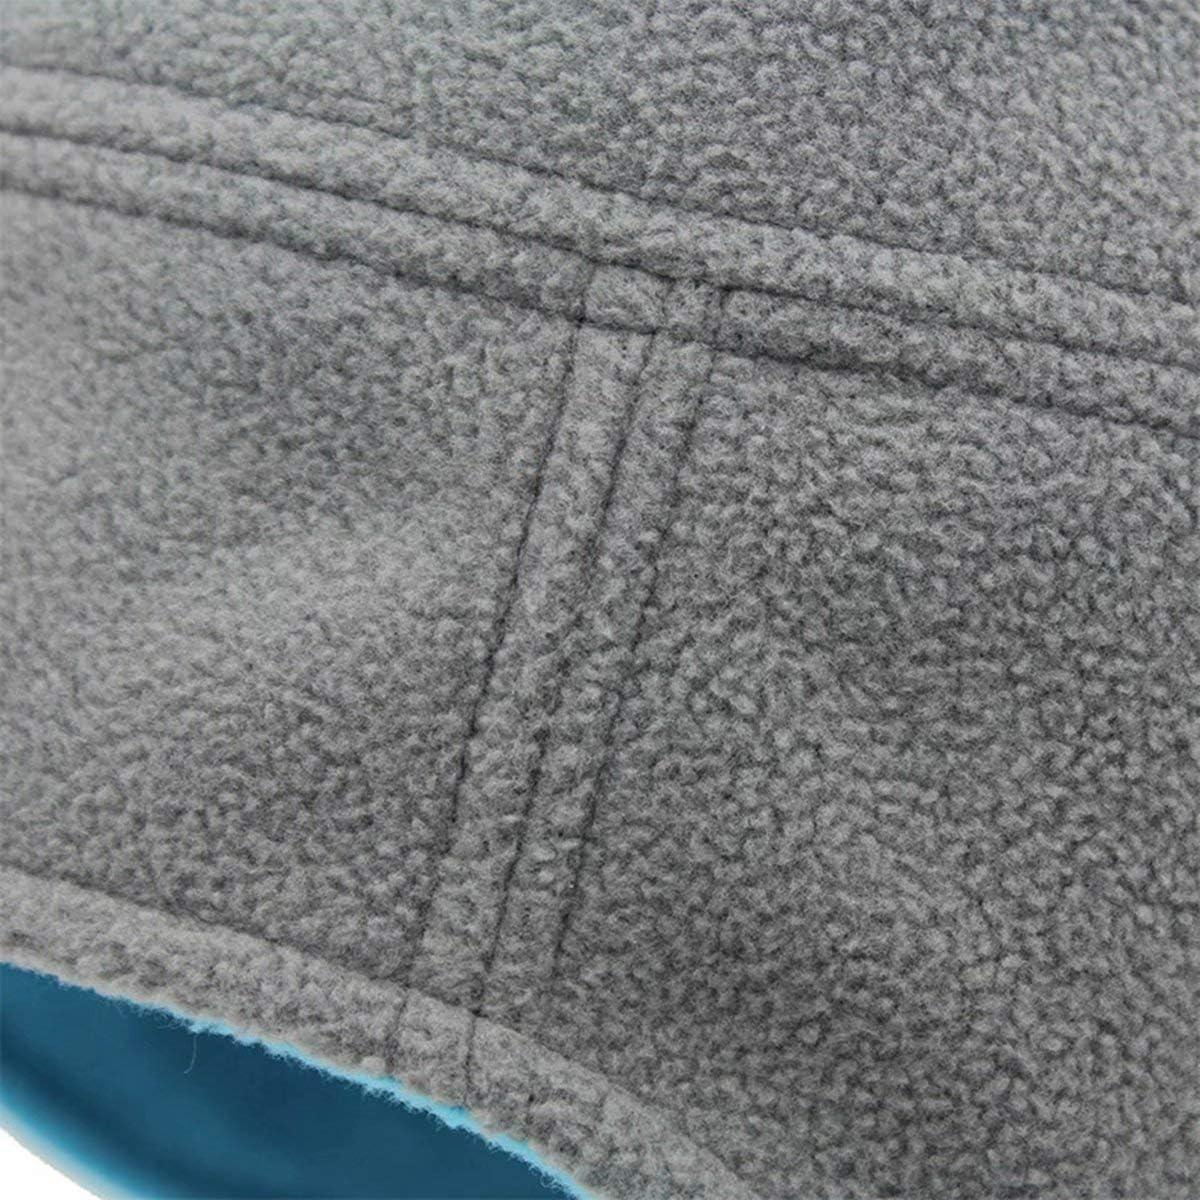 Vimfashi Soft Lightweight Skull Cap Thermal Cycling Beanie Hat for Men Women